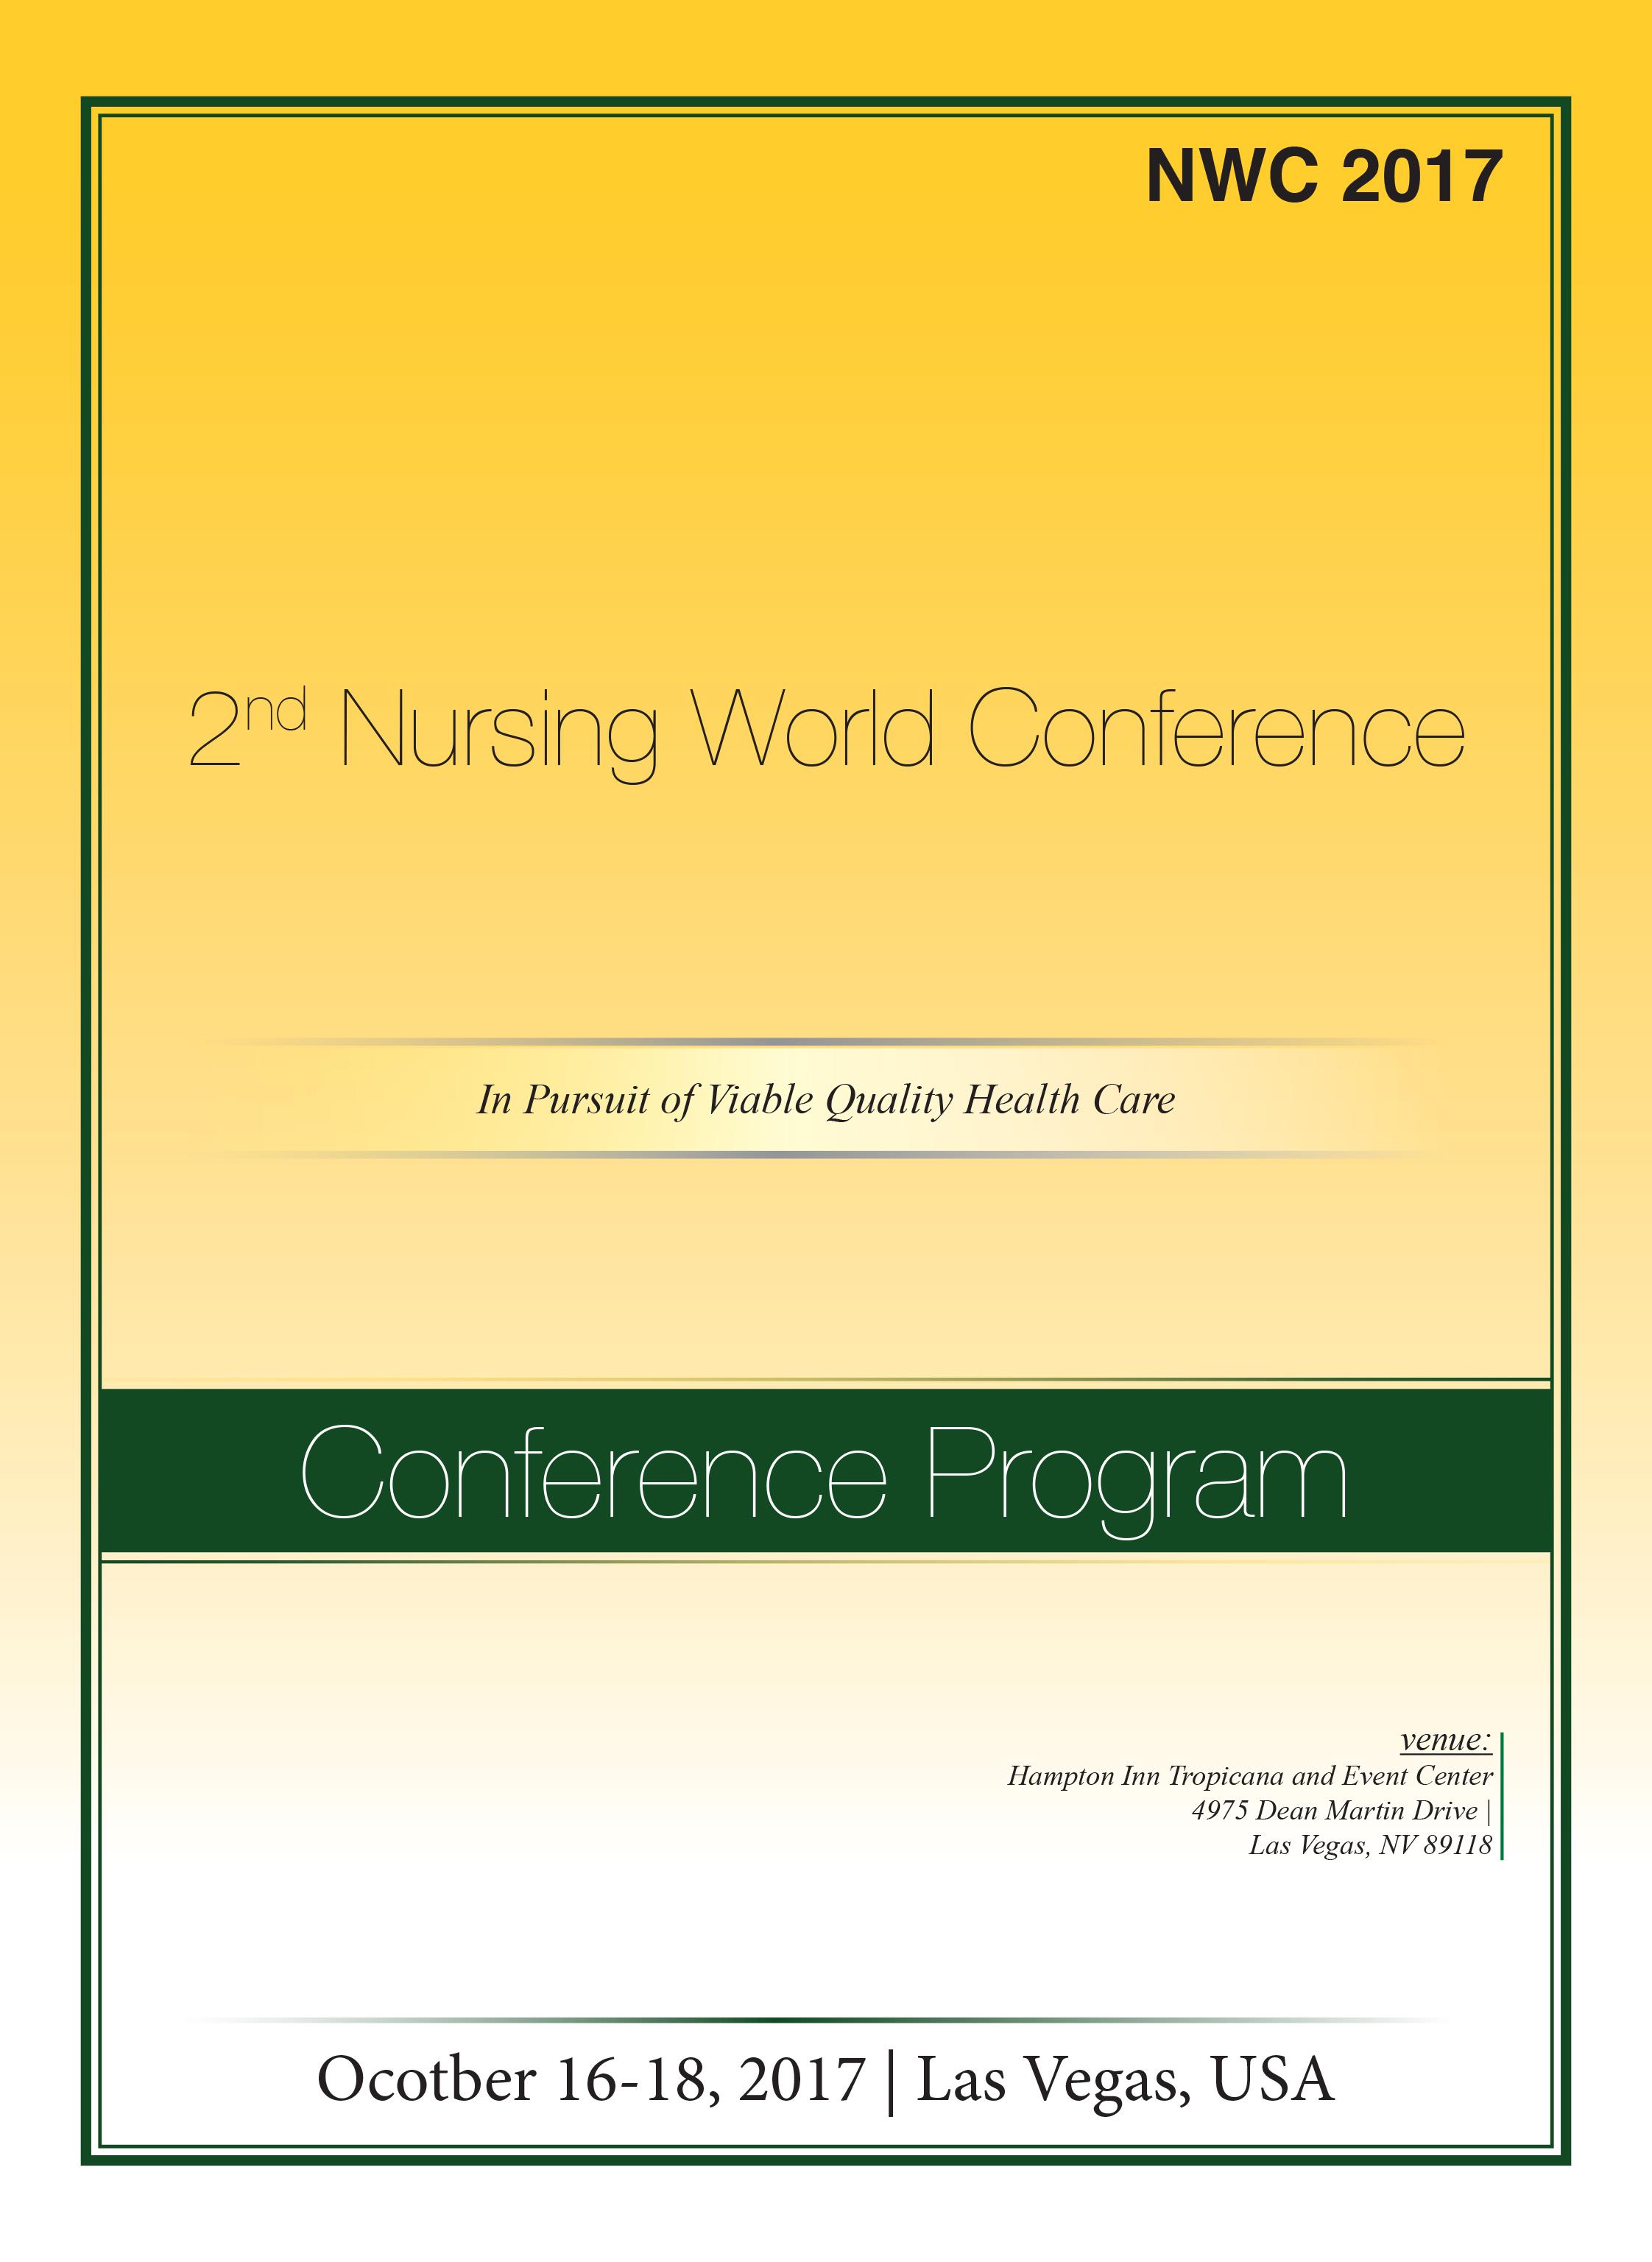 2nd Nursing World Conference   Las Vegas, USA Program